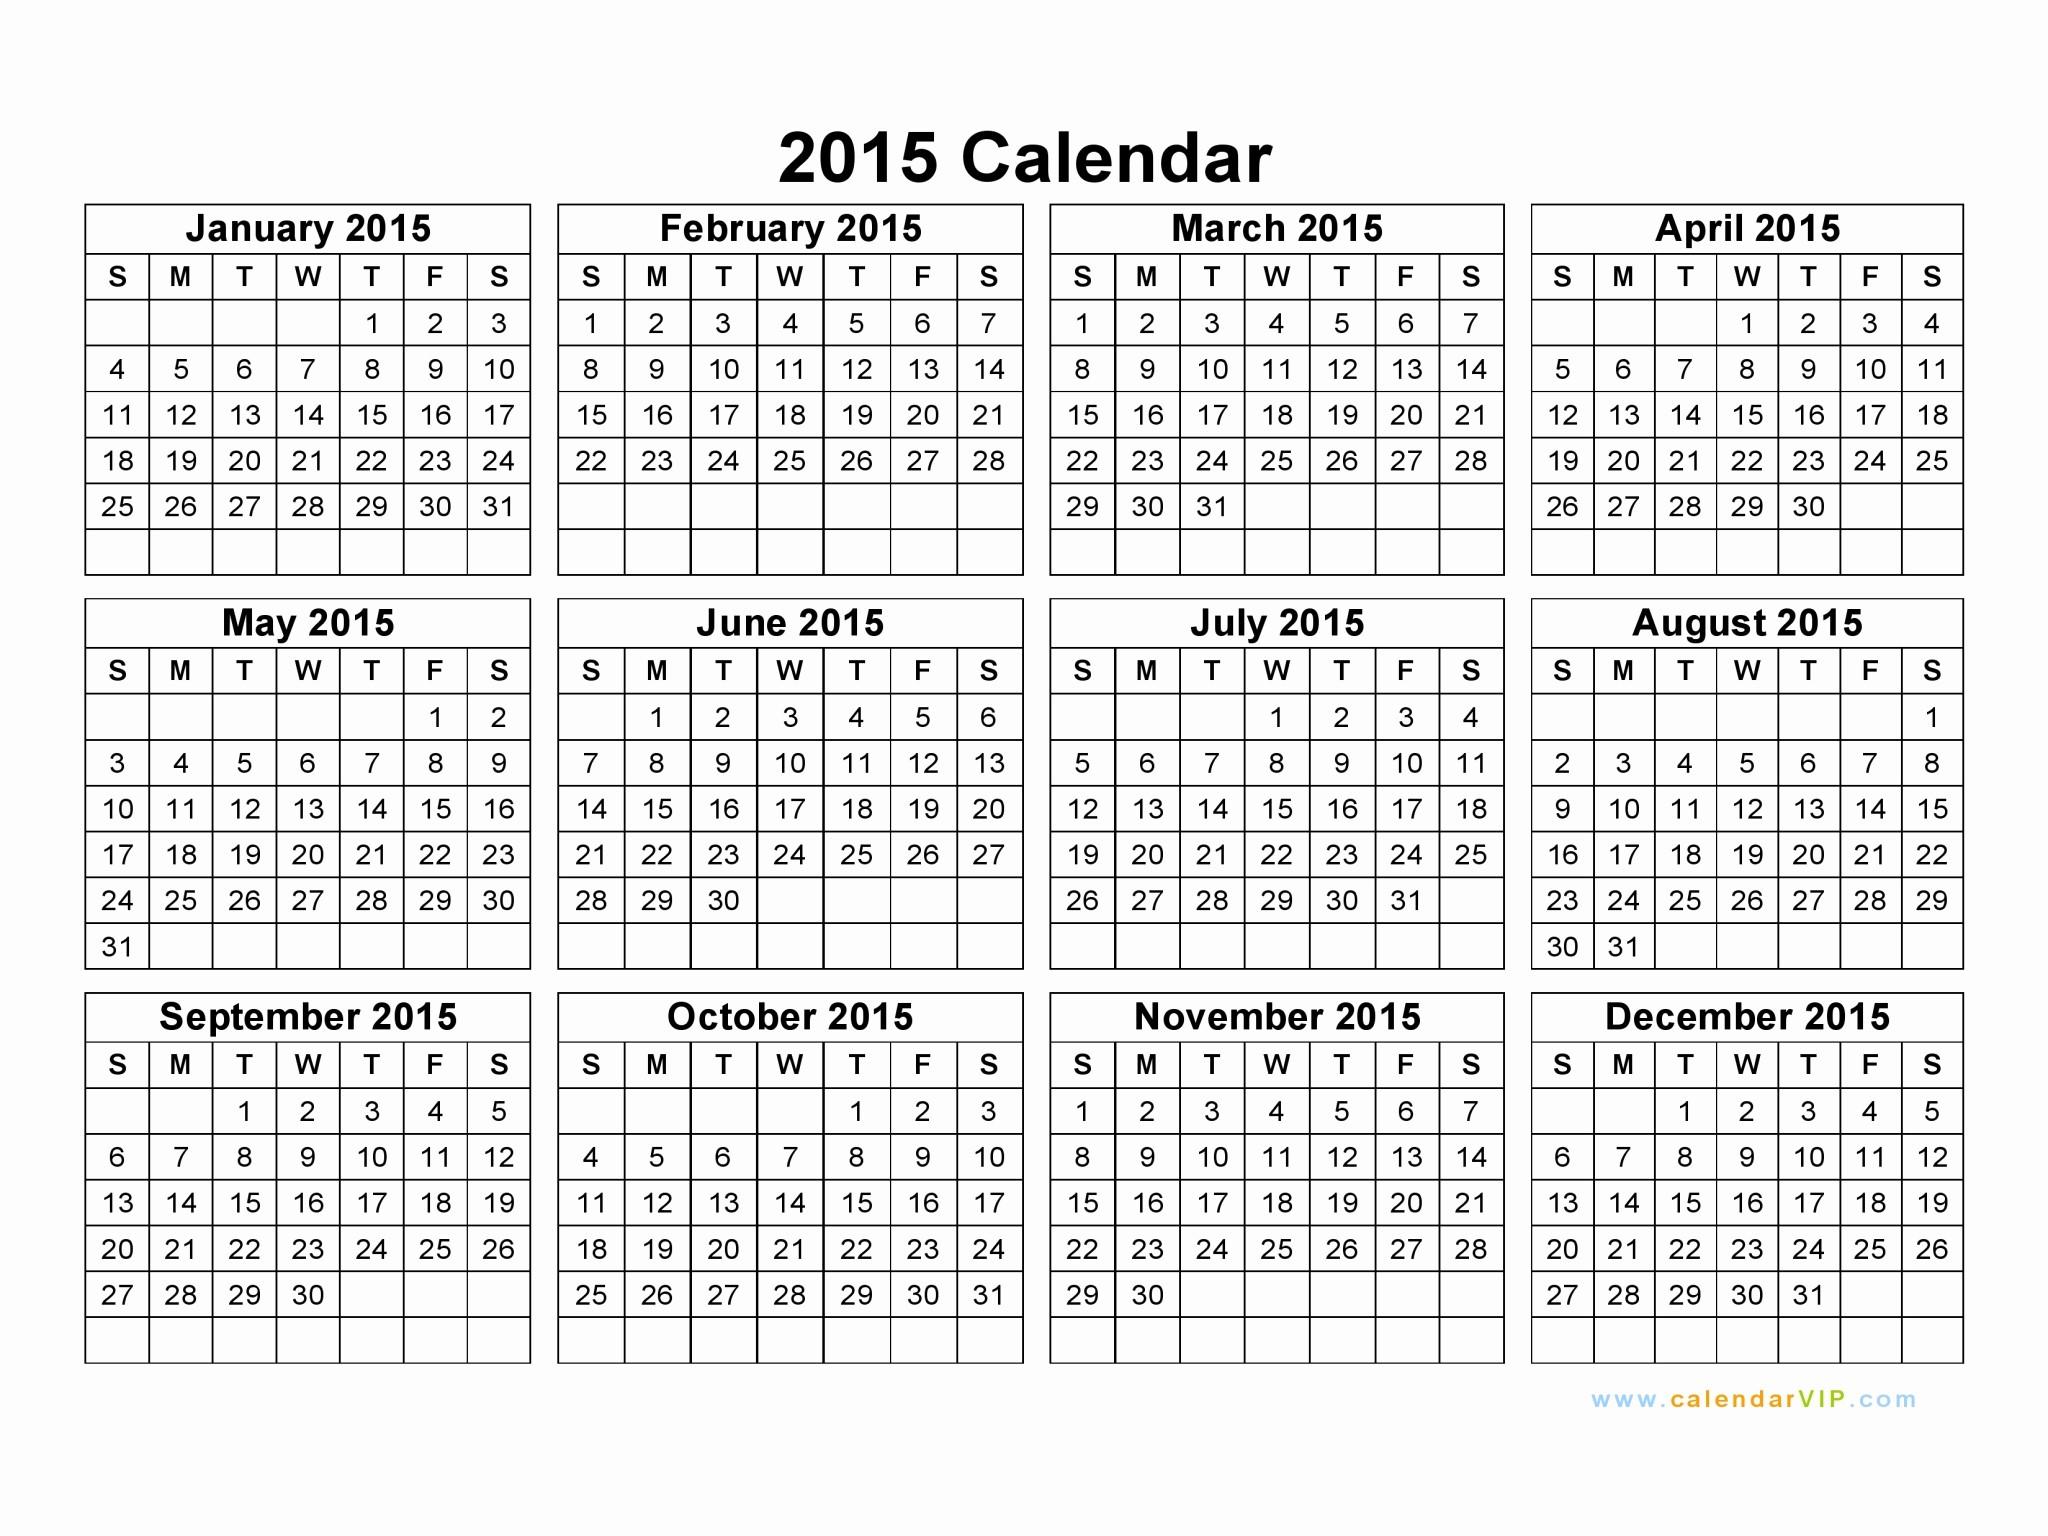 Full Year Calendar Template 2015 Luxury 2015 Calendar Blank Printable Calendar Template In Pdf